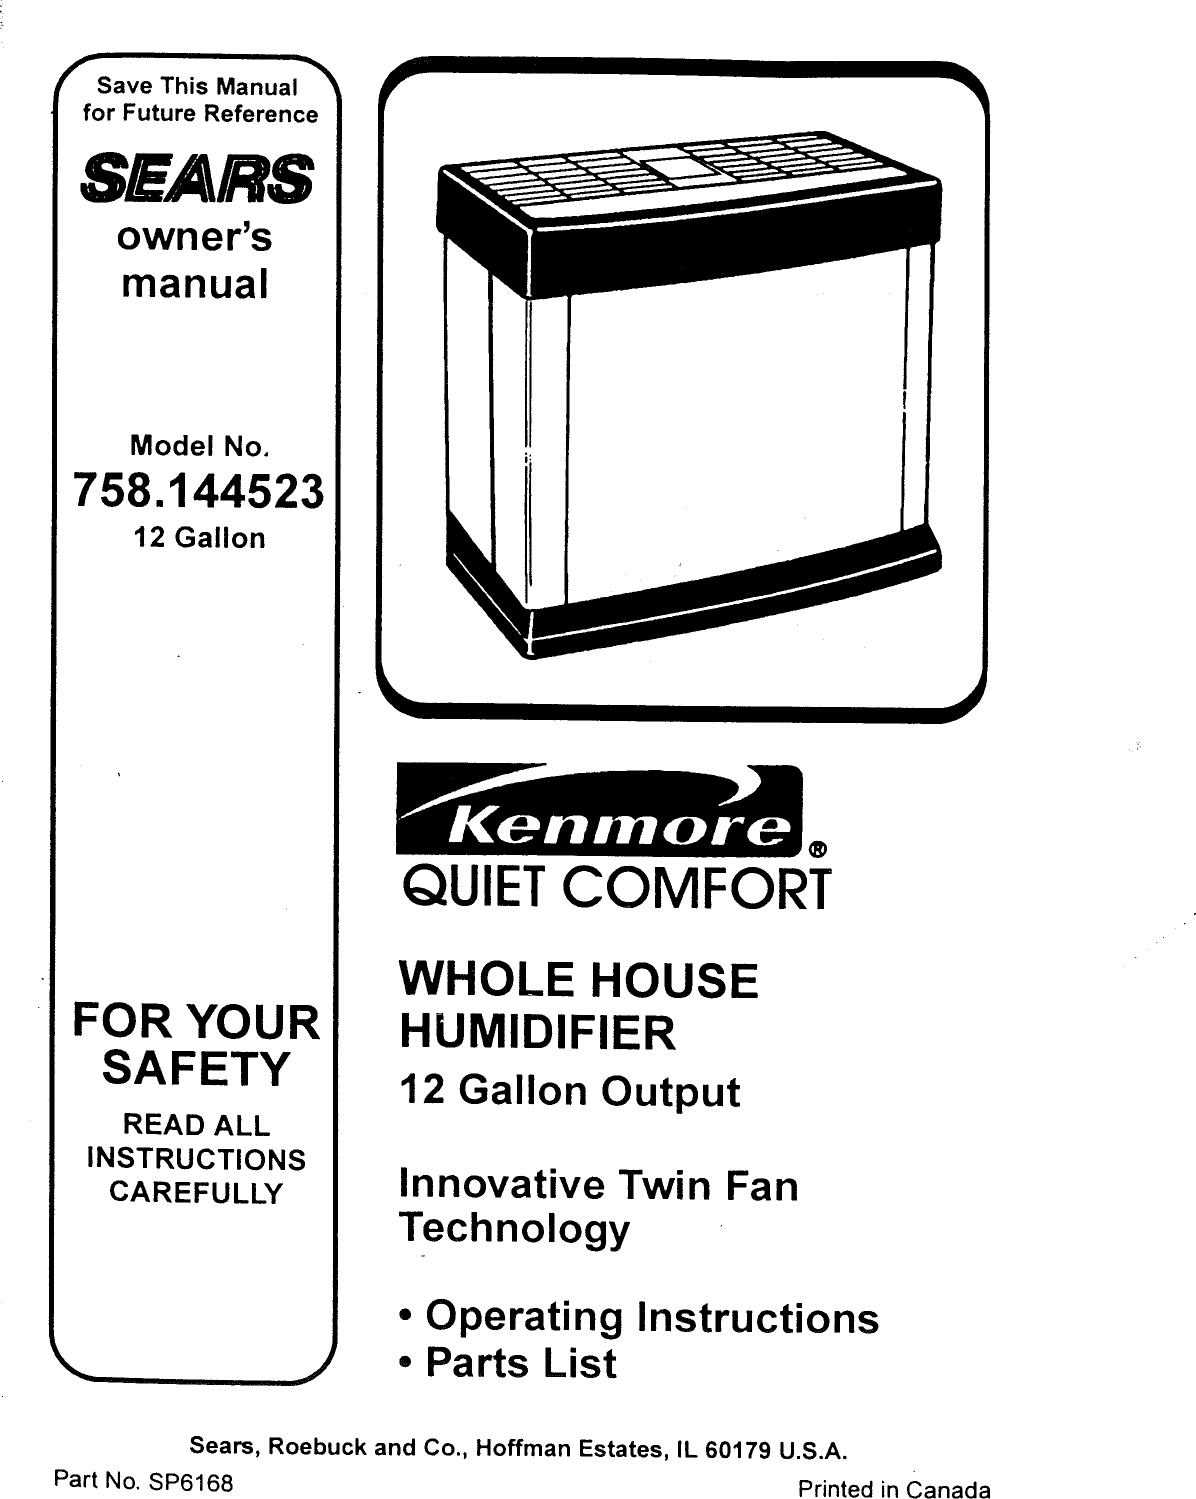 Kenmore 758144523 User Manual HUMIDIFIER Manuals And